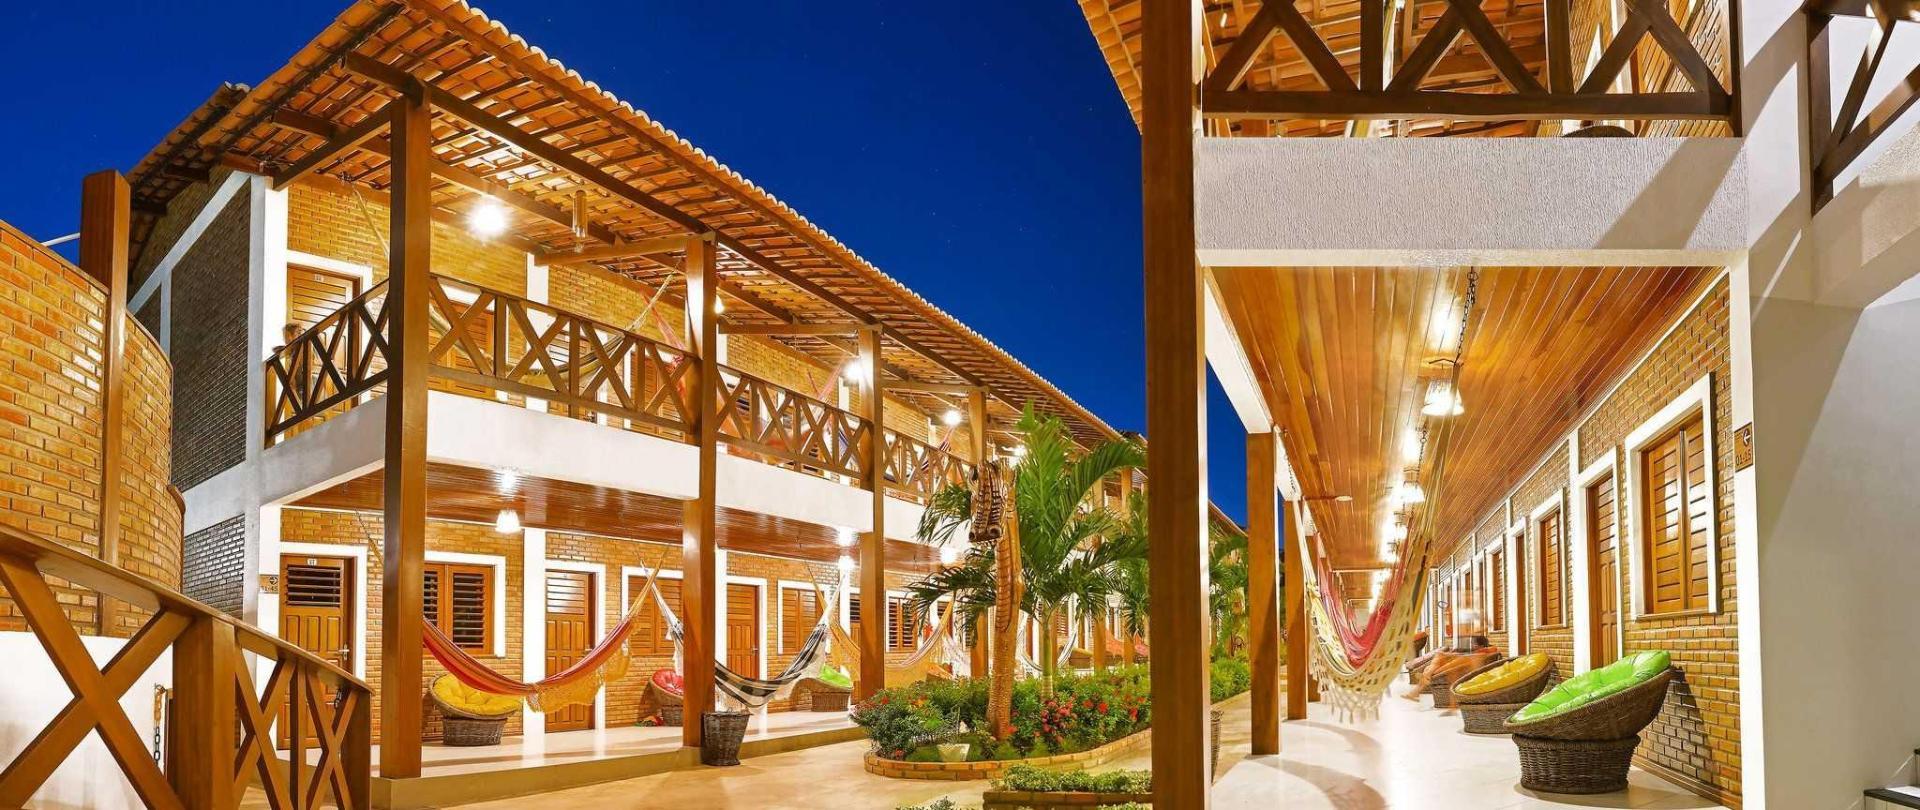 hotel_jeri_2016_panoramica_41.jpg